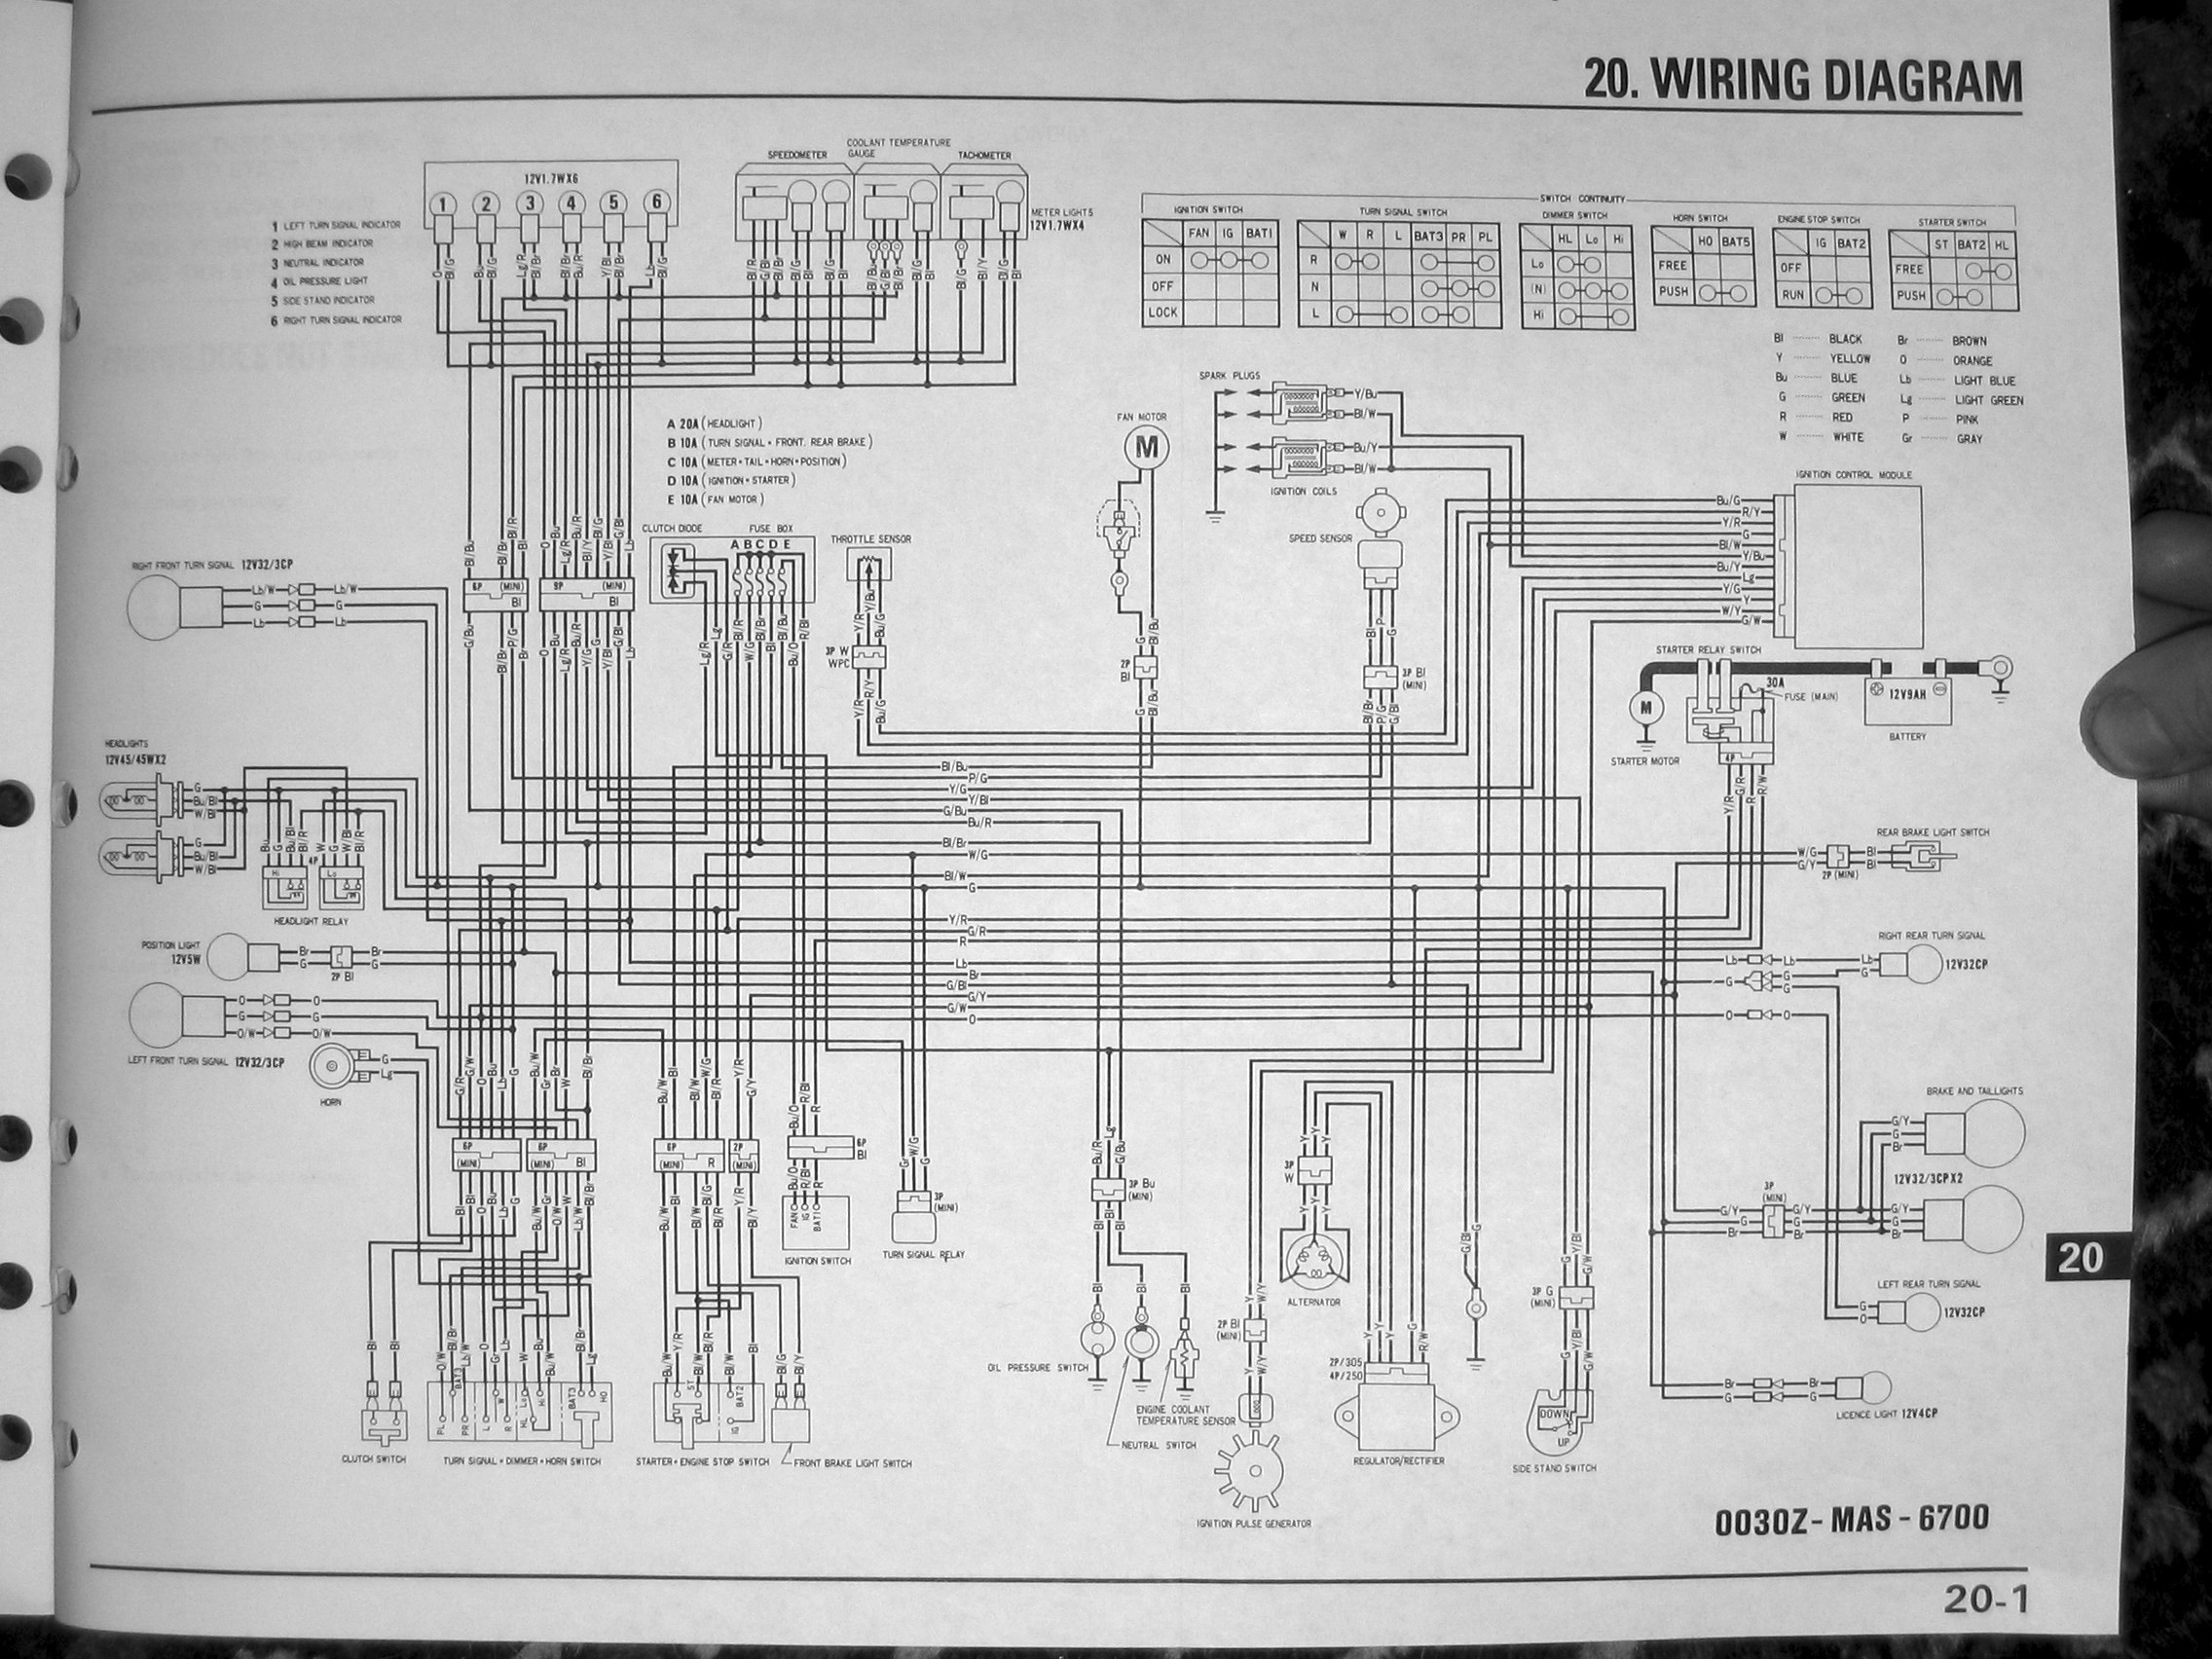 1996 gsxr 750 wiring diagram   28 wiring diagram images